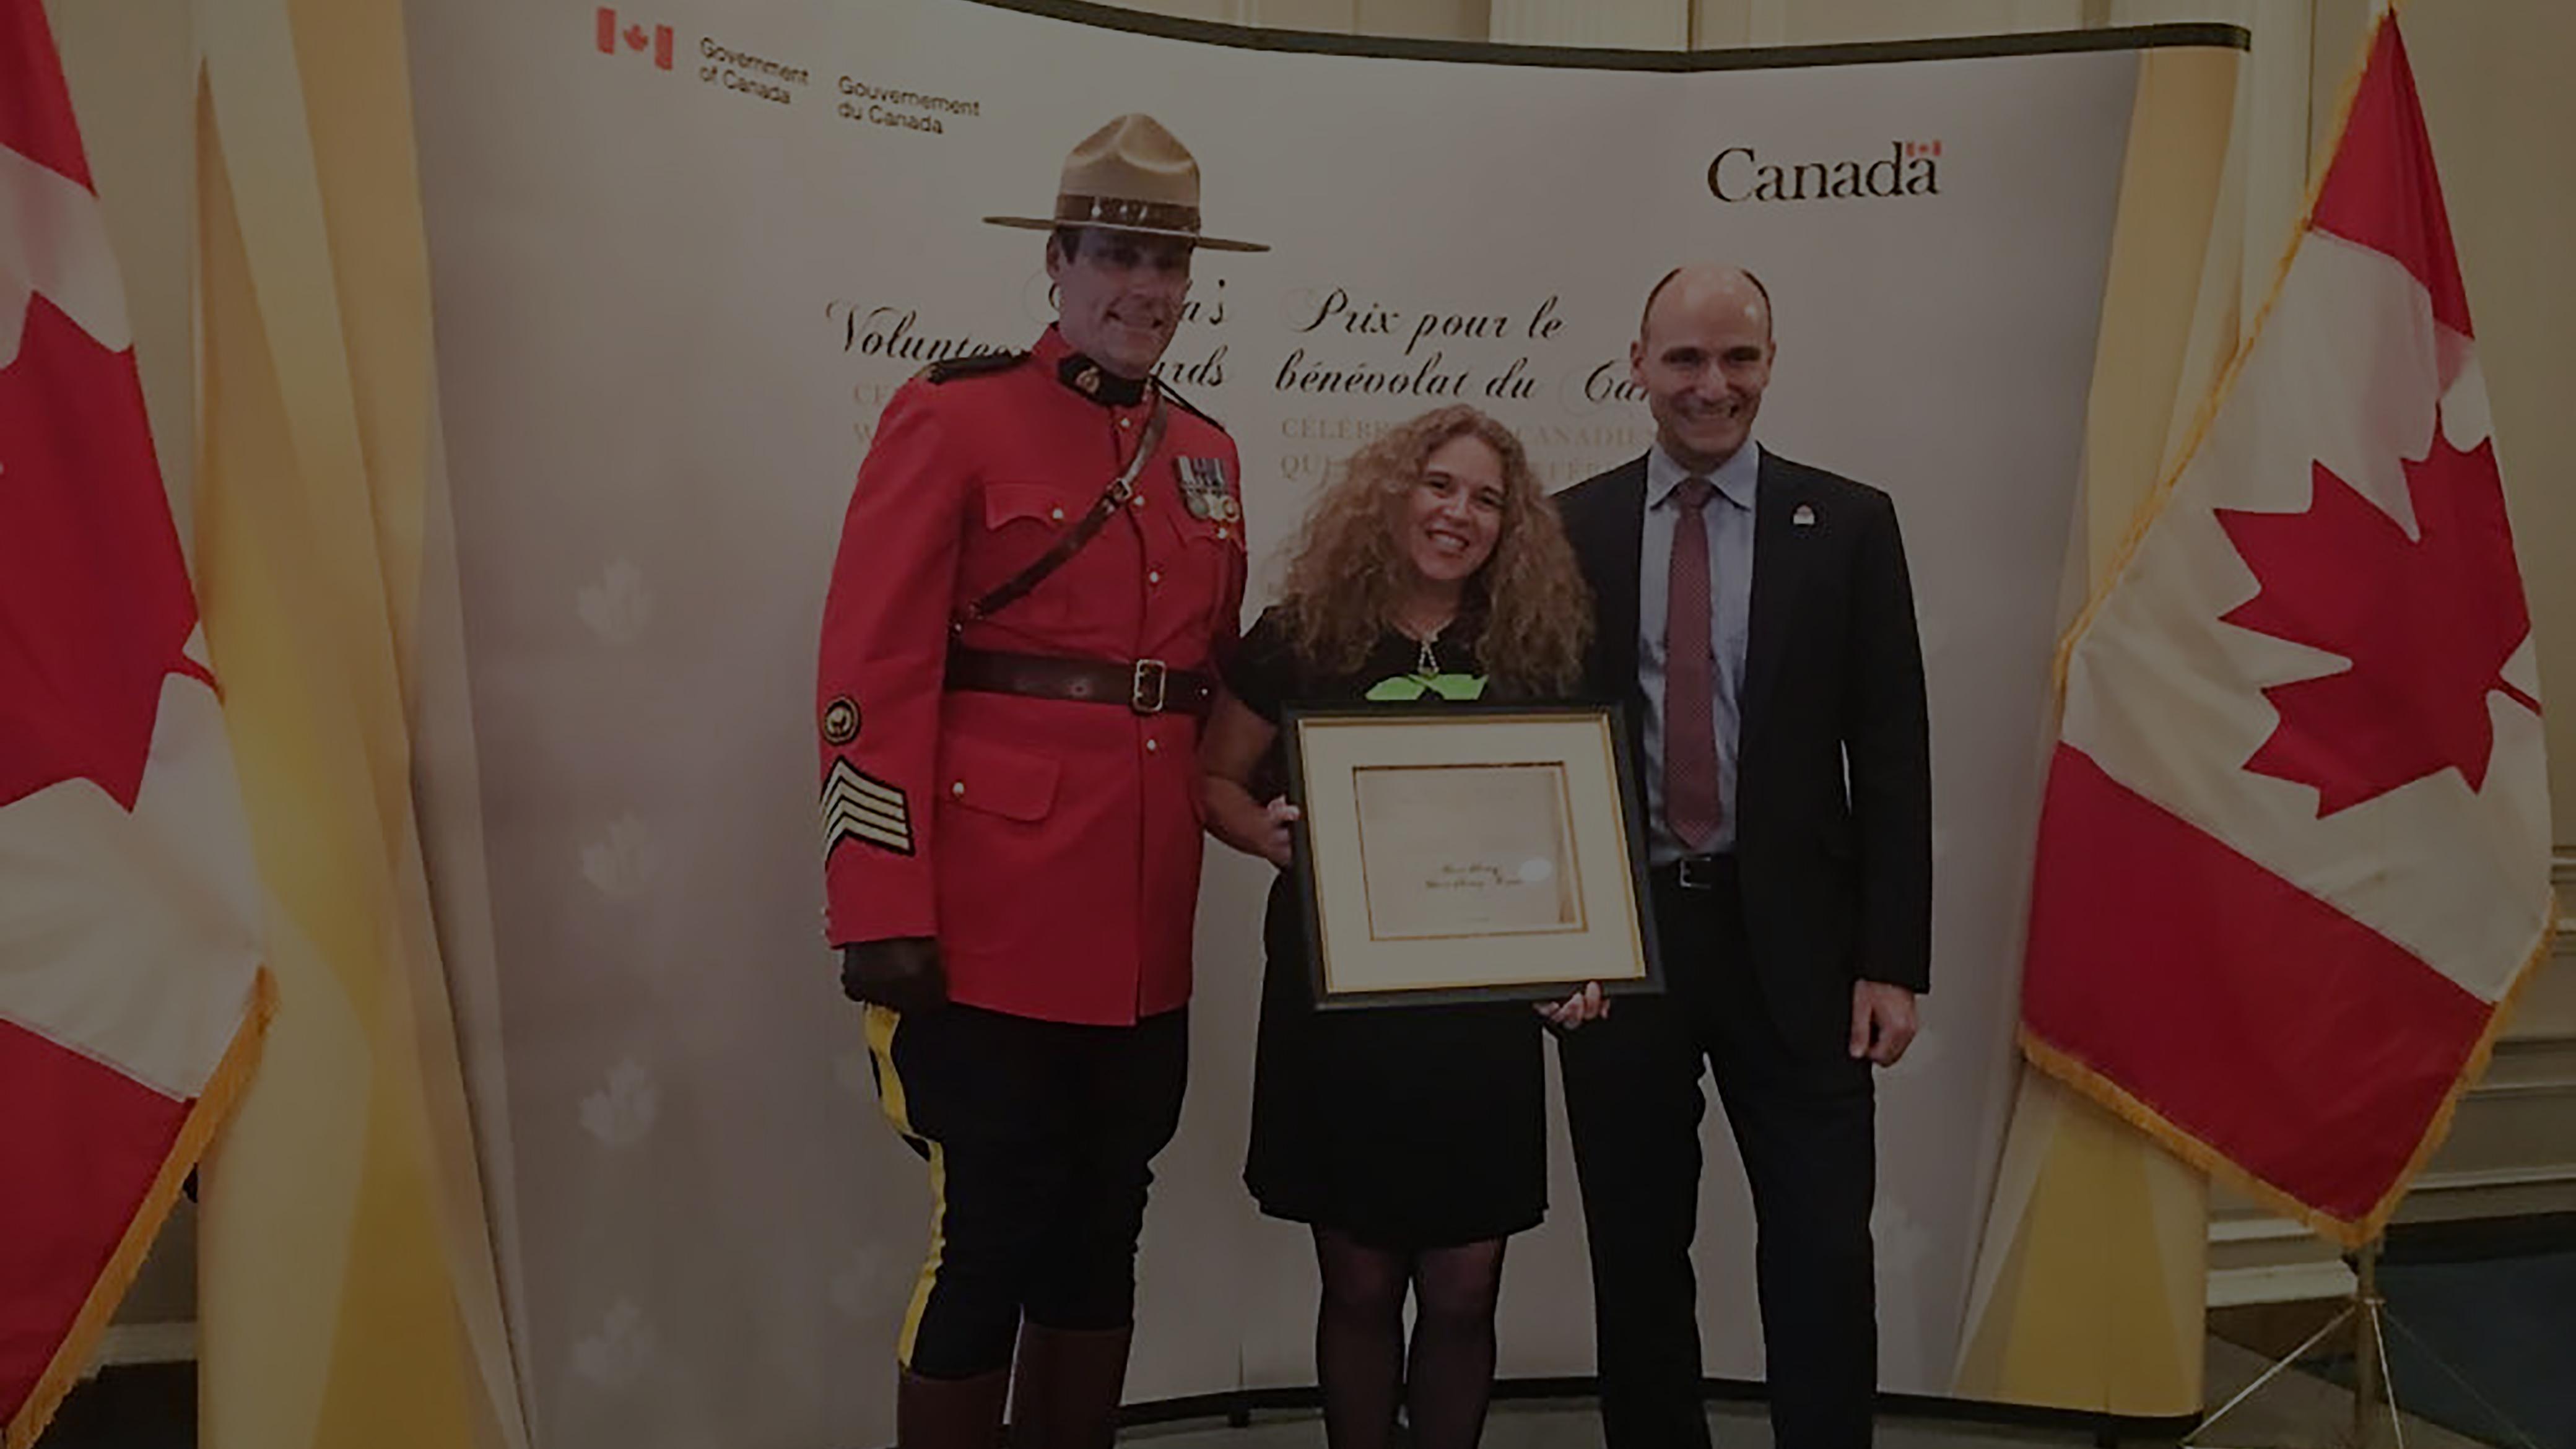 2017 Canada's Volunteer Awards recipient